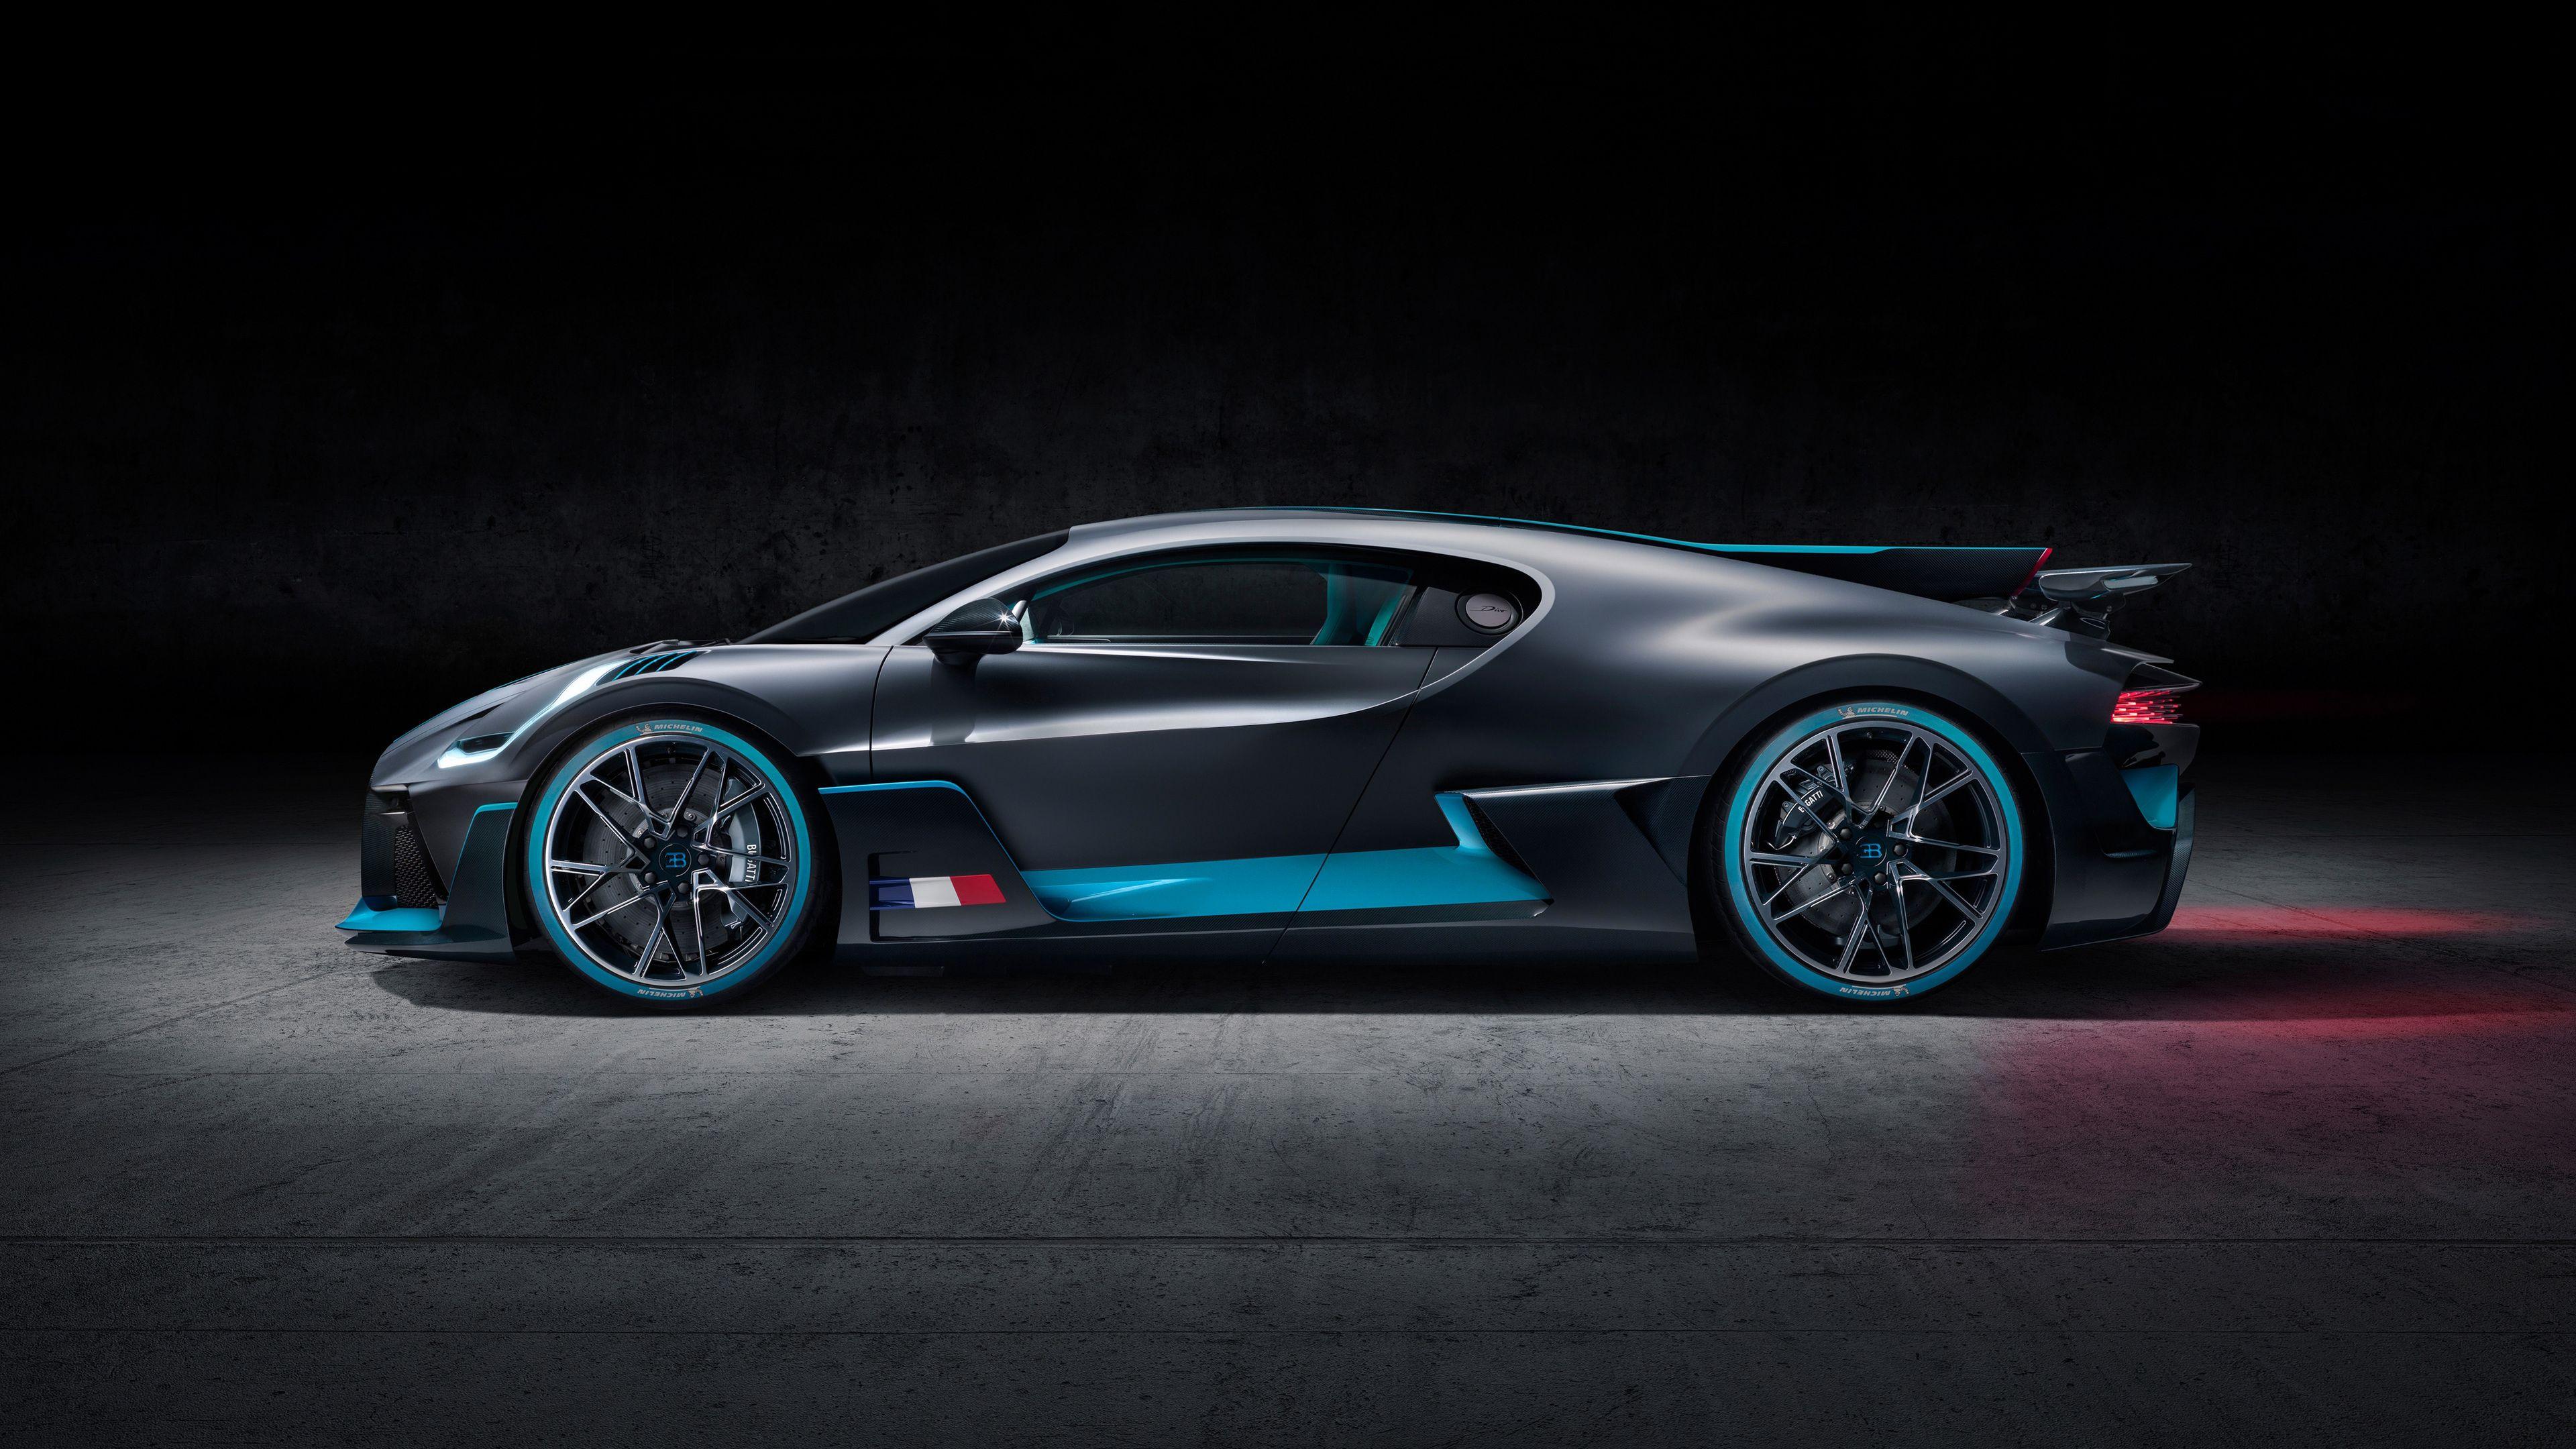 2018 Bugatti Divo Side View Hd Wallpapers Cars Wallpapers Bugatti